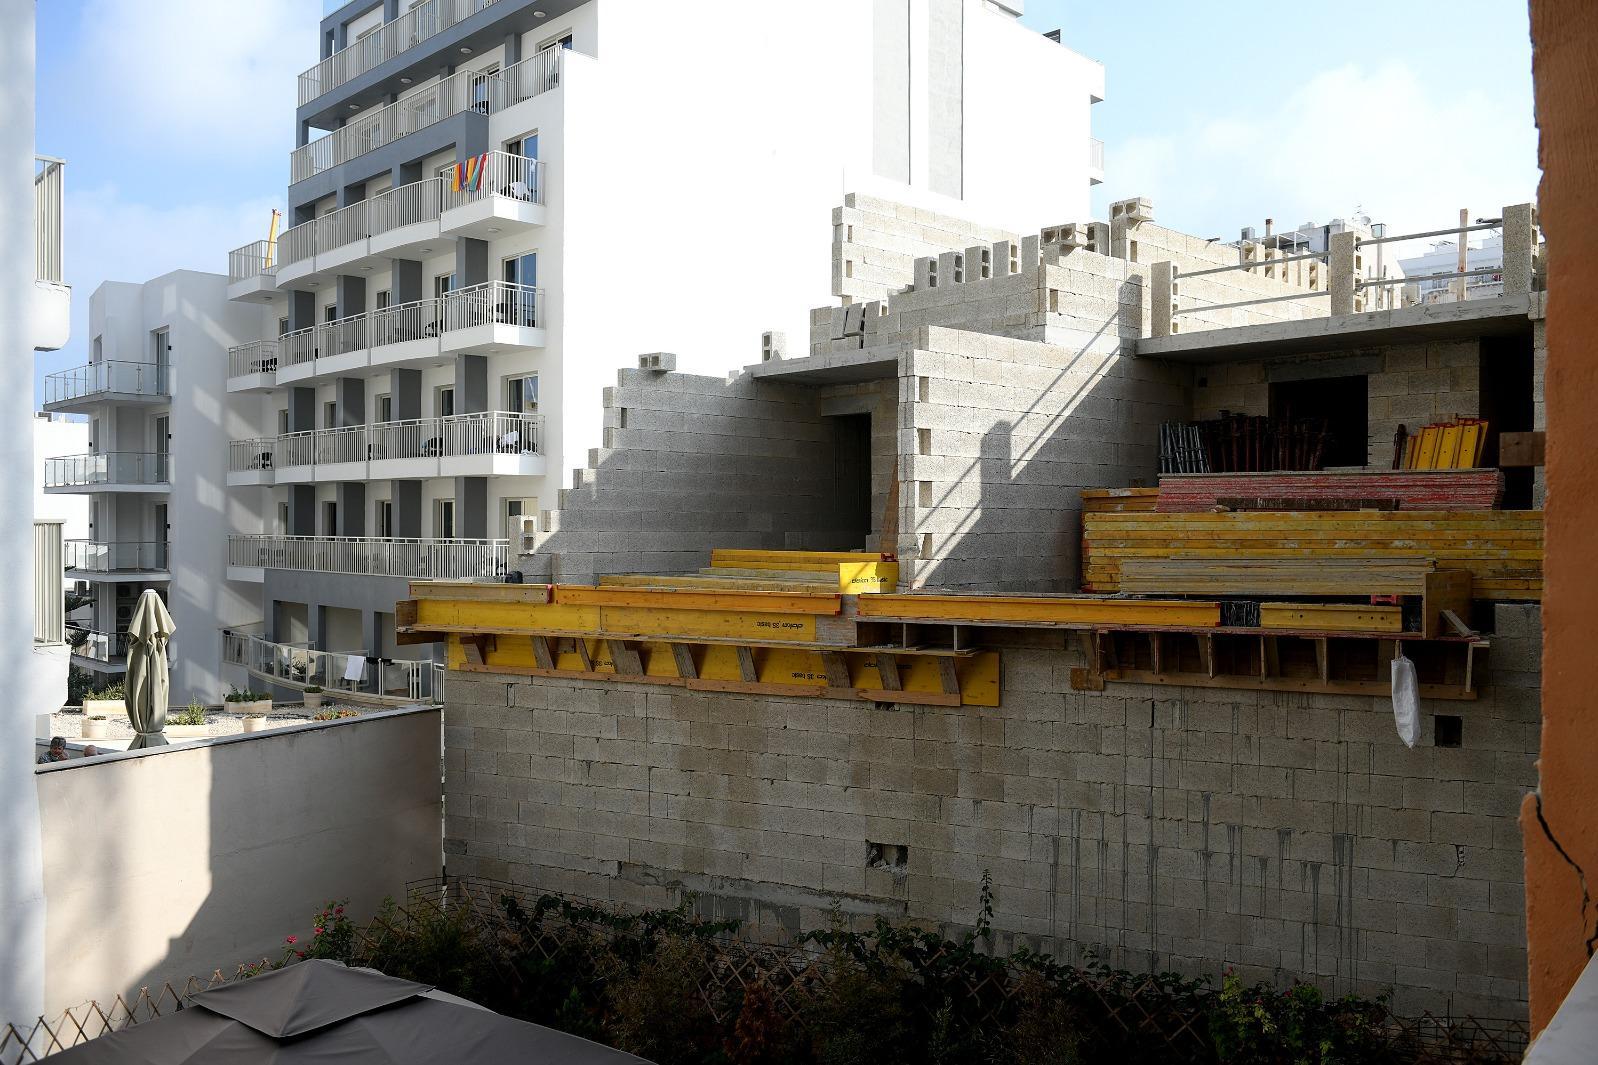 The construction site at Triq Dun Sciberras, Mellieha. Photo: Matthew Mirabelli